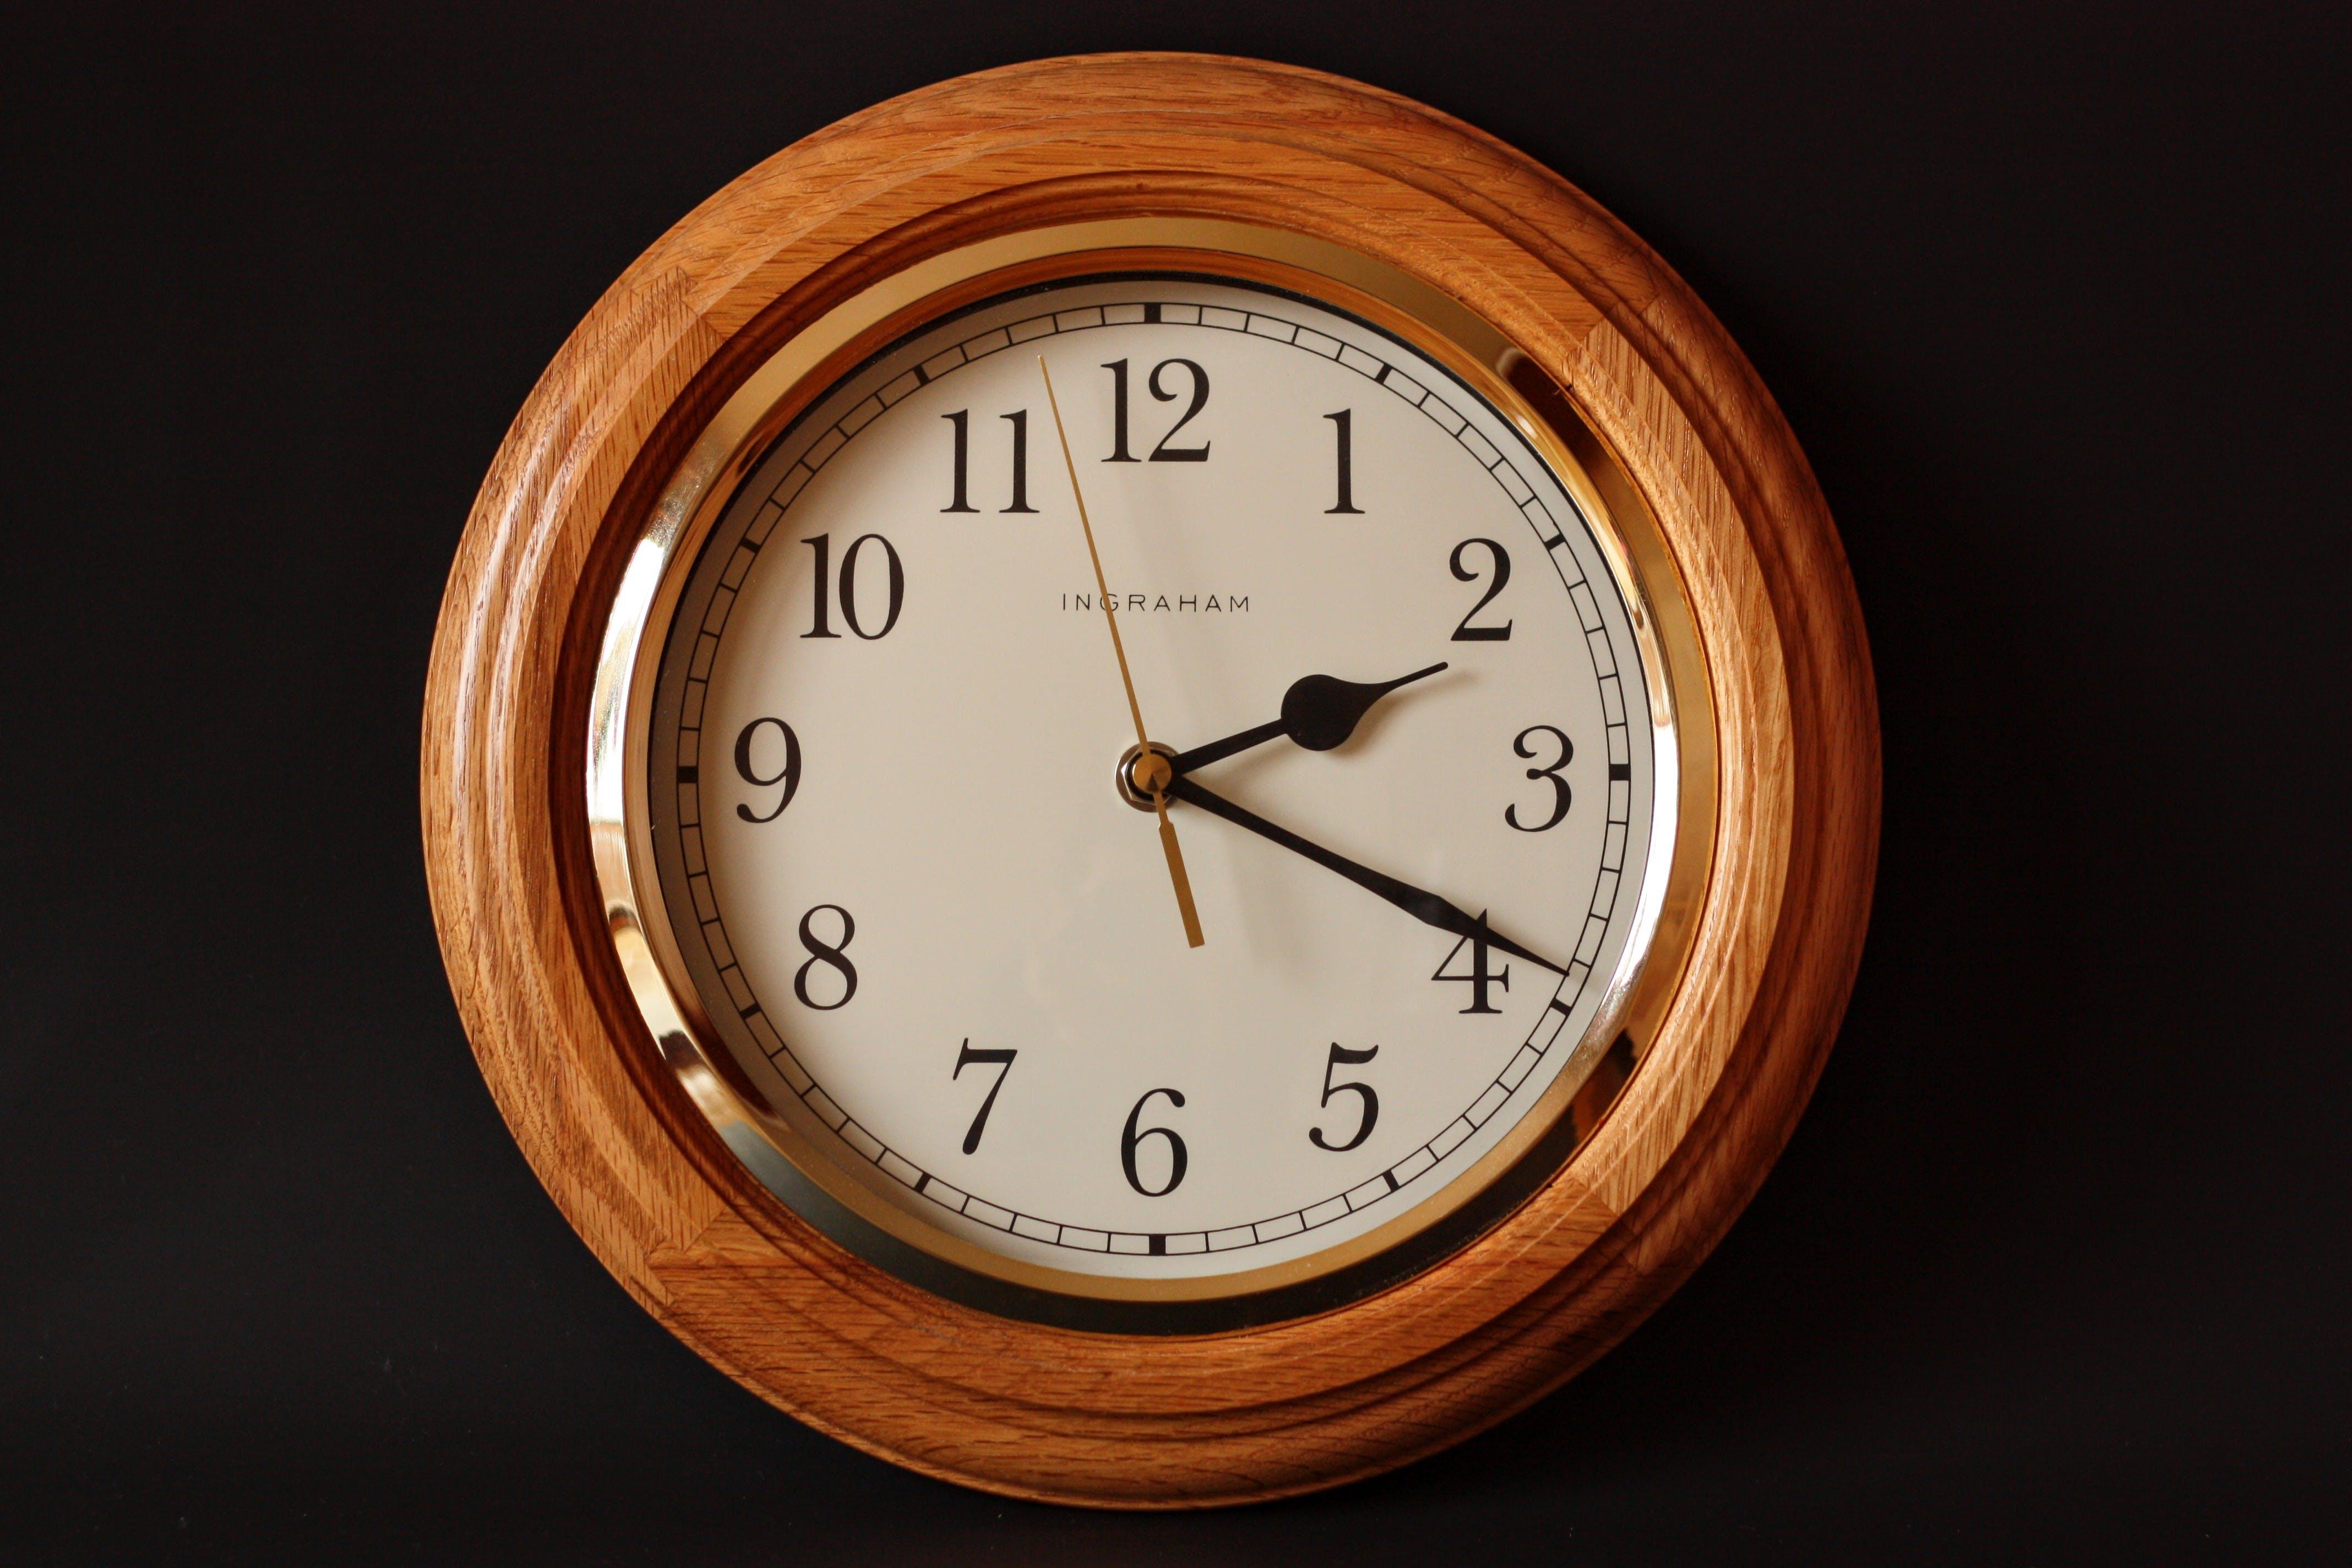 Brown Wooden Framed Clock Showing 2:19